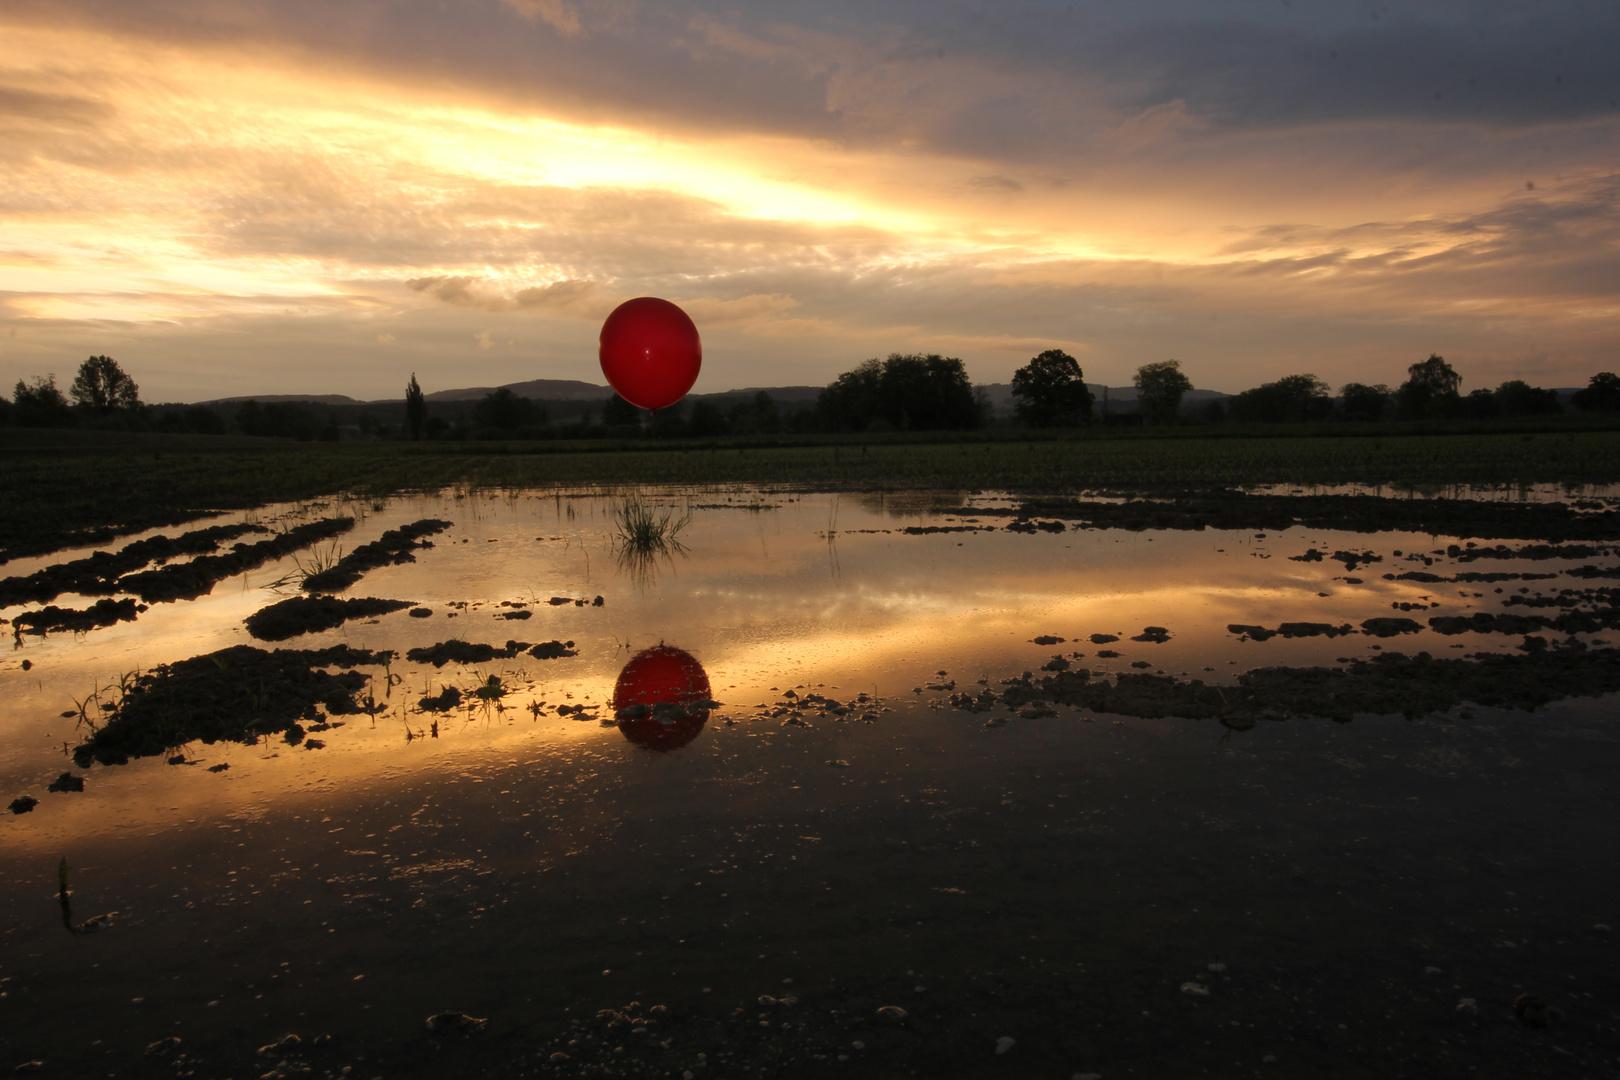 Sonnenaufgang mit rotem Ballon